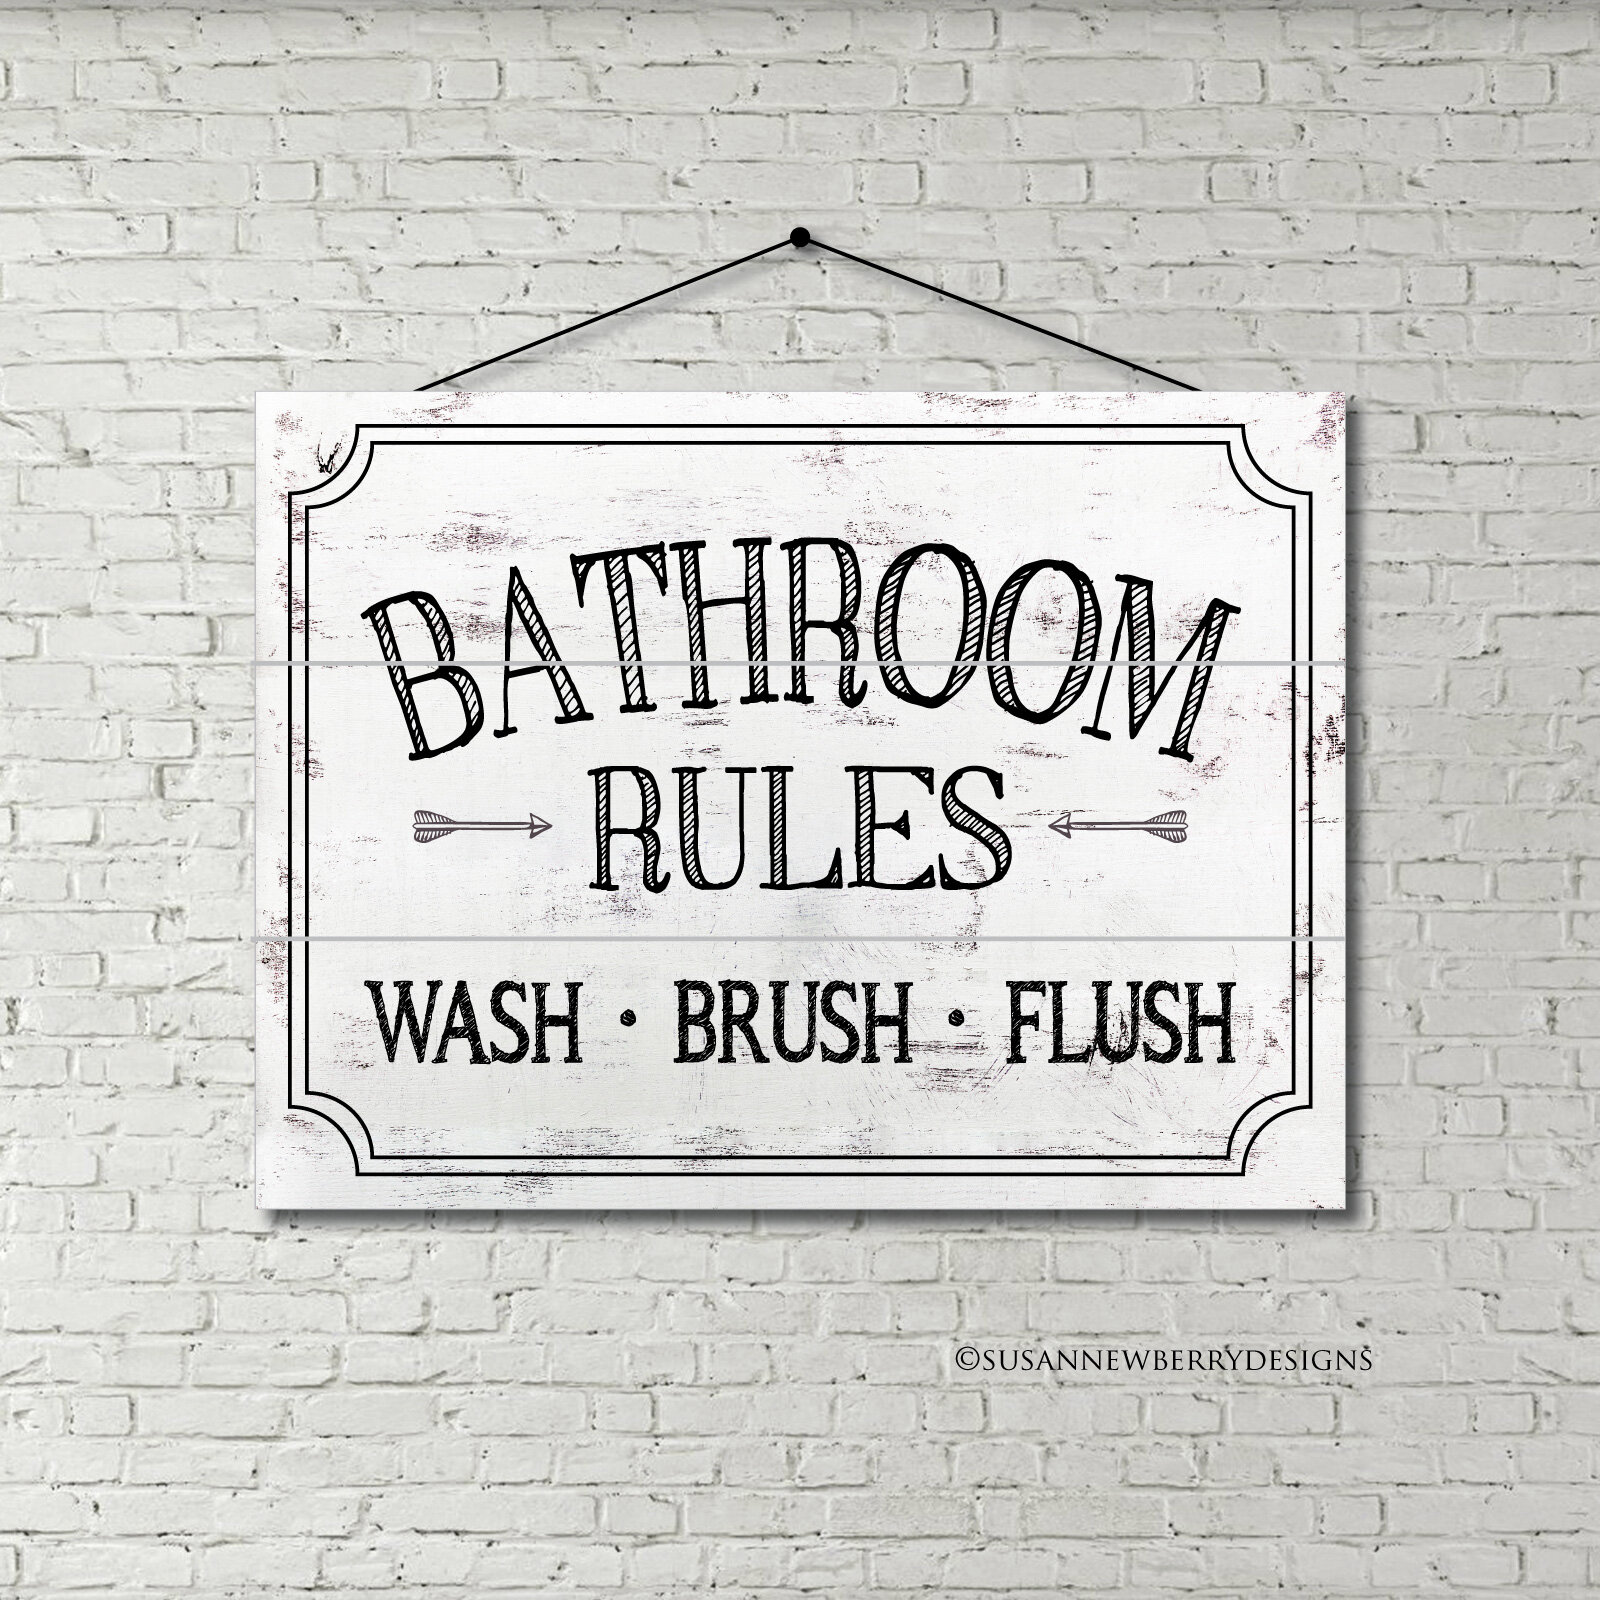 Wood Pallet Bathroom Rules